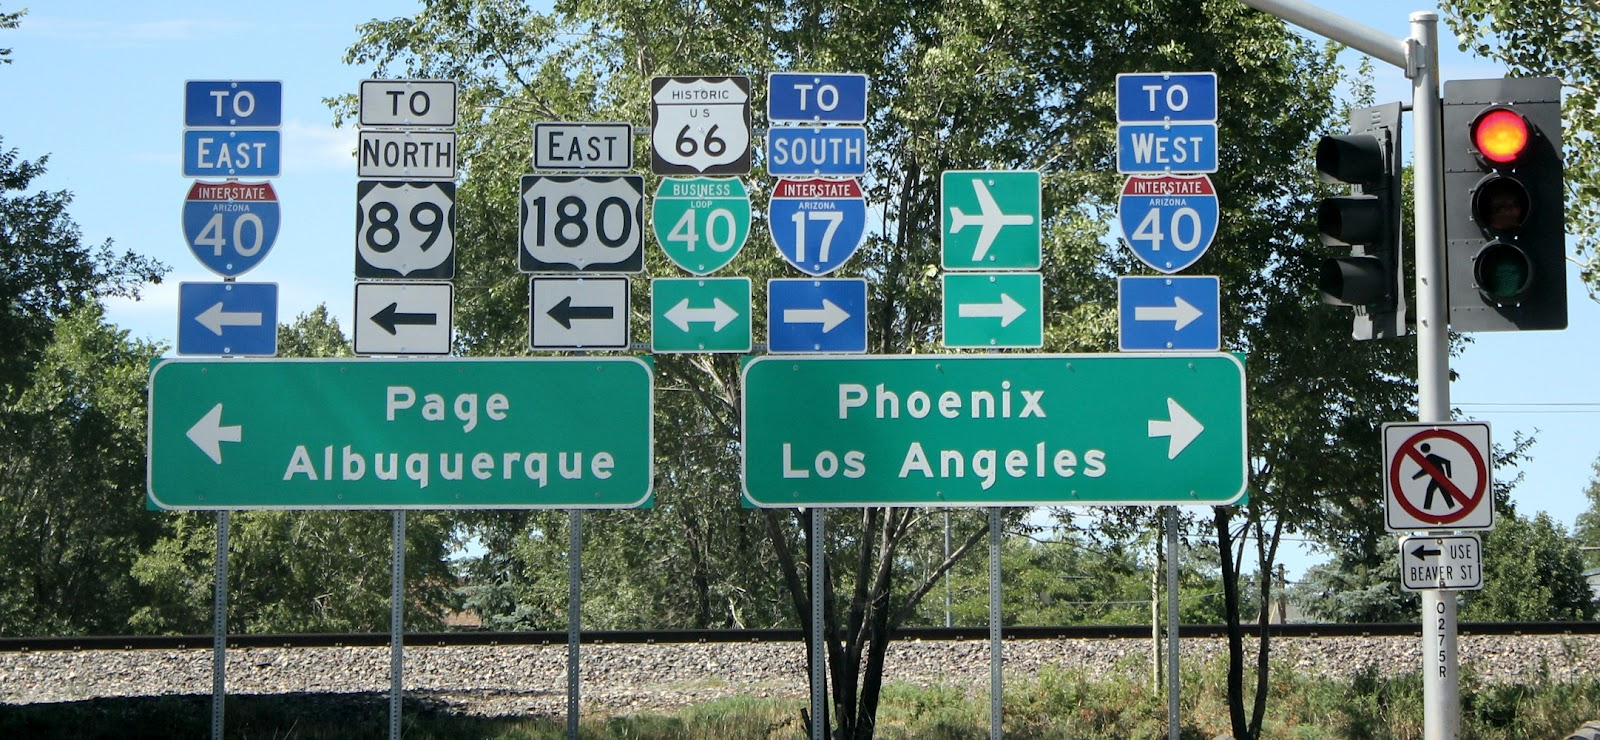 The Journey Of Viva Las Vegas Grand Canyon Route 66 Las Vegas